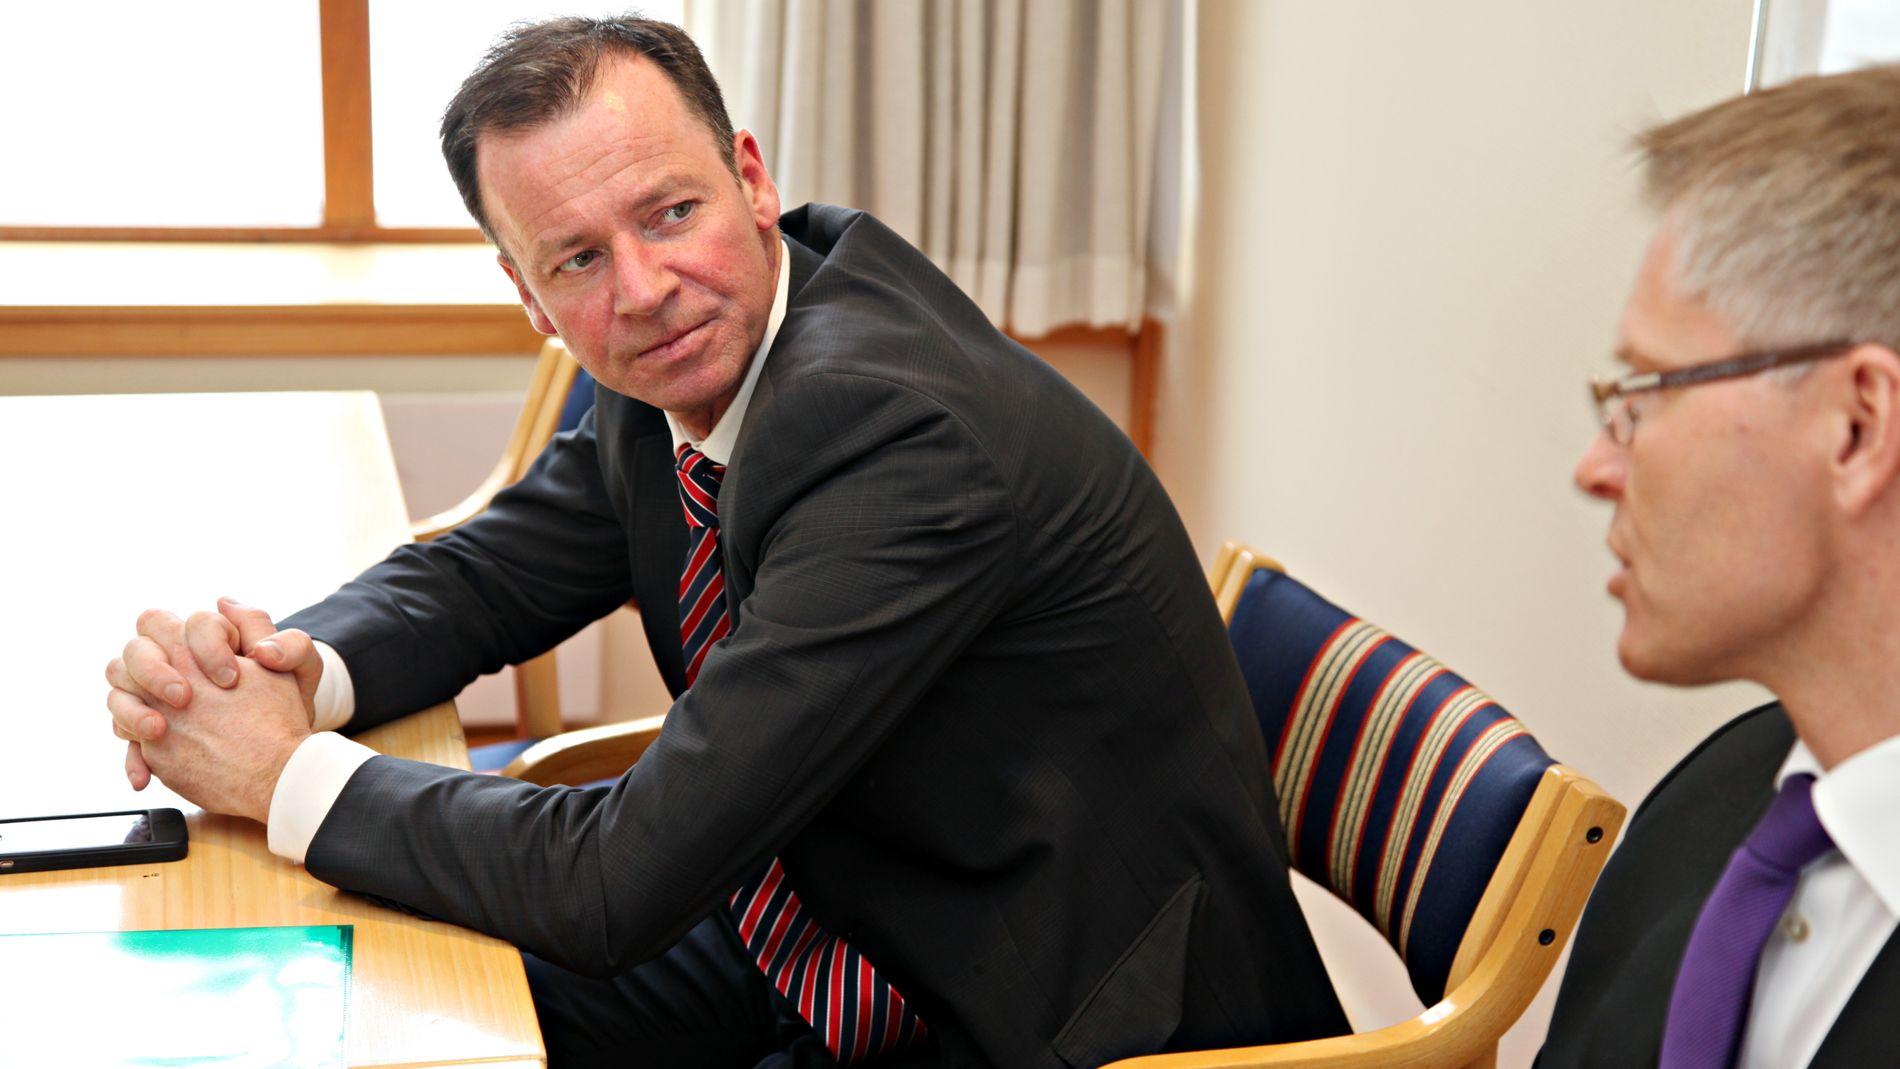 TIDLIGERE POLITIKER: Roger Ingebrigtsen har erfaring som statssekretær for Arbeiderpartiet. Her fra 2011.